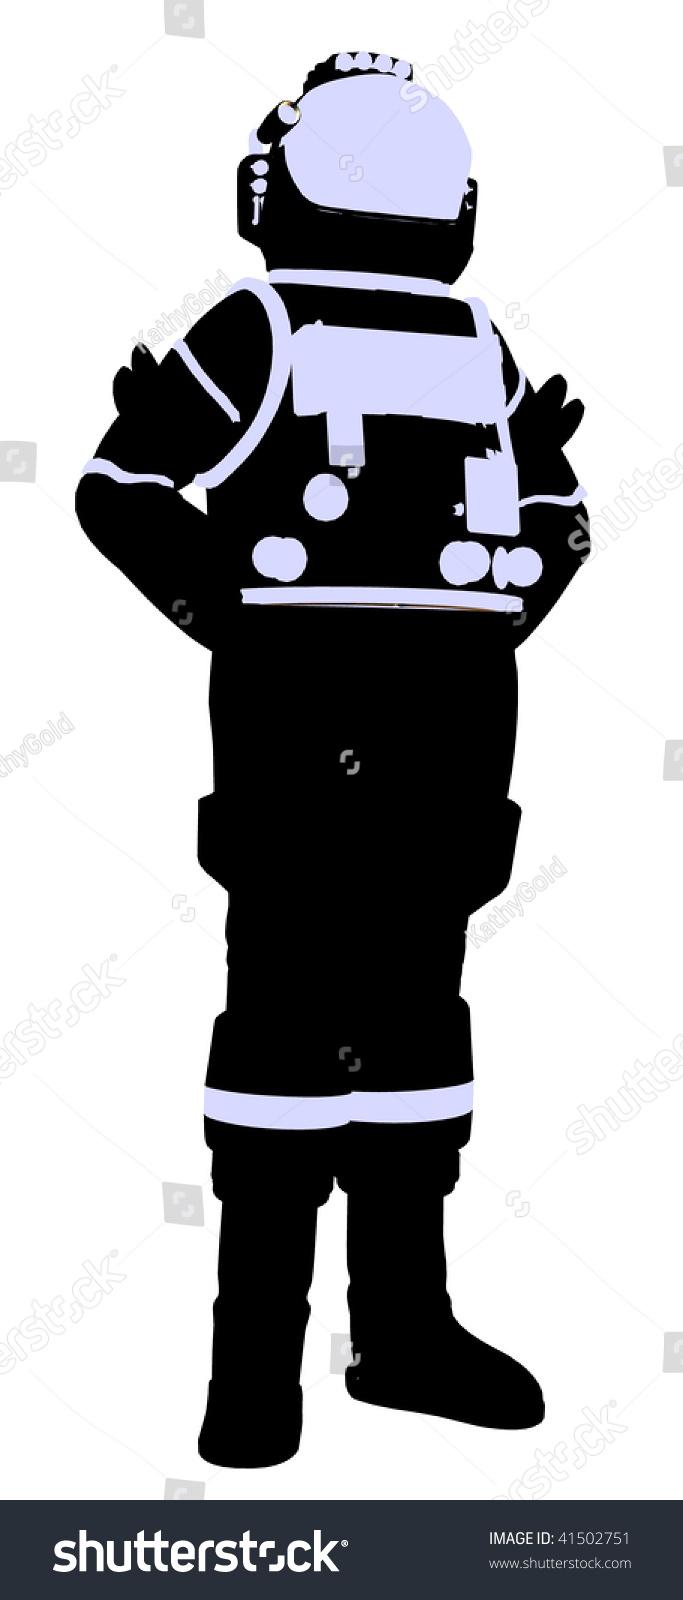 astronaut silhouette vector - photo #23